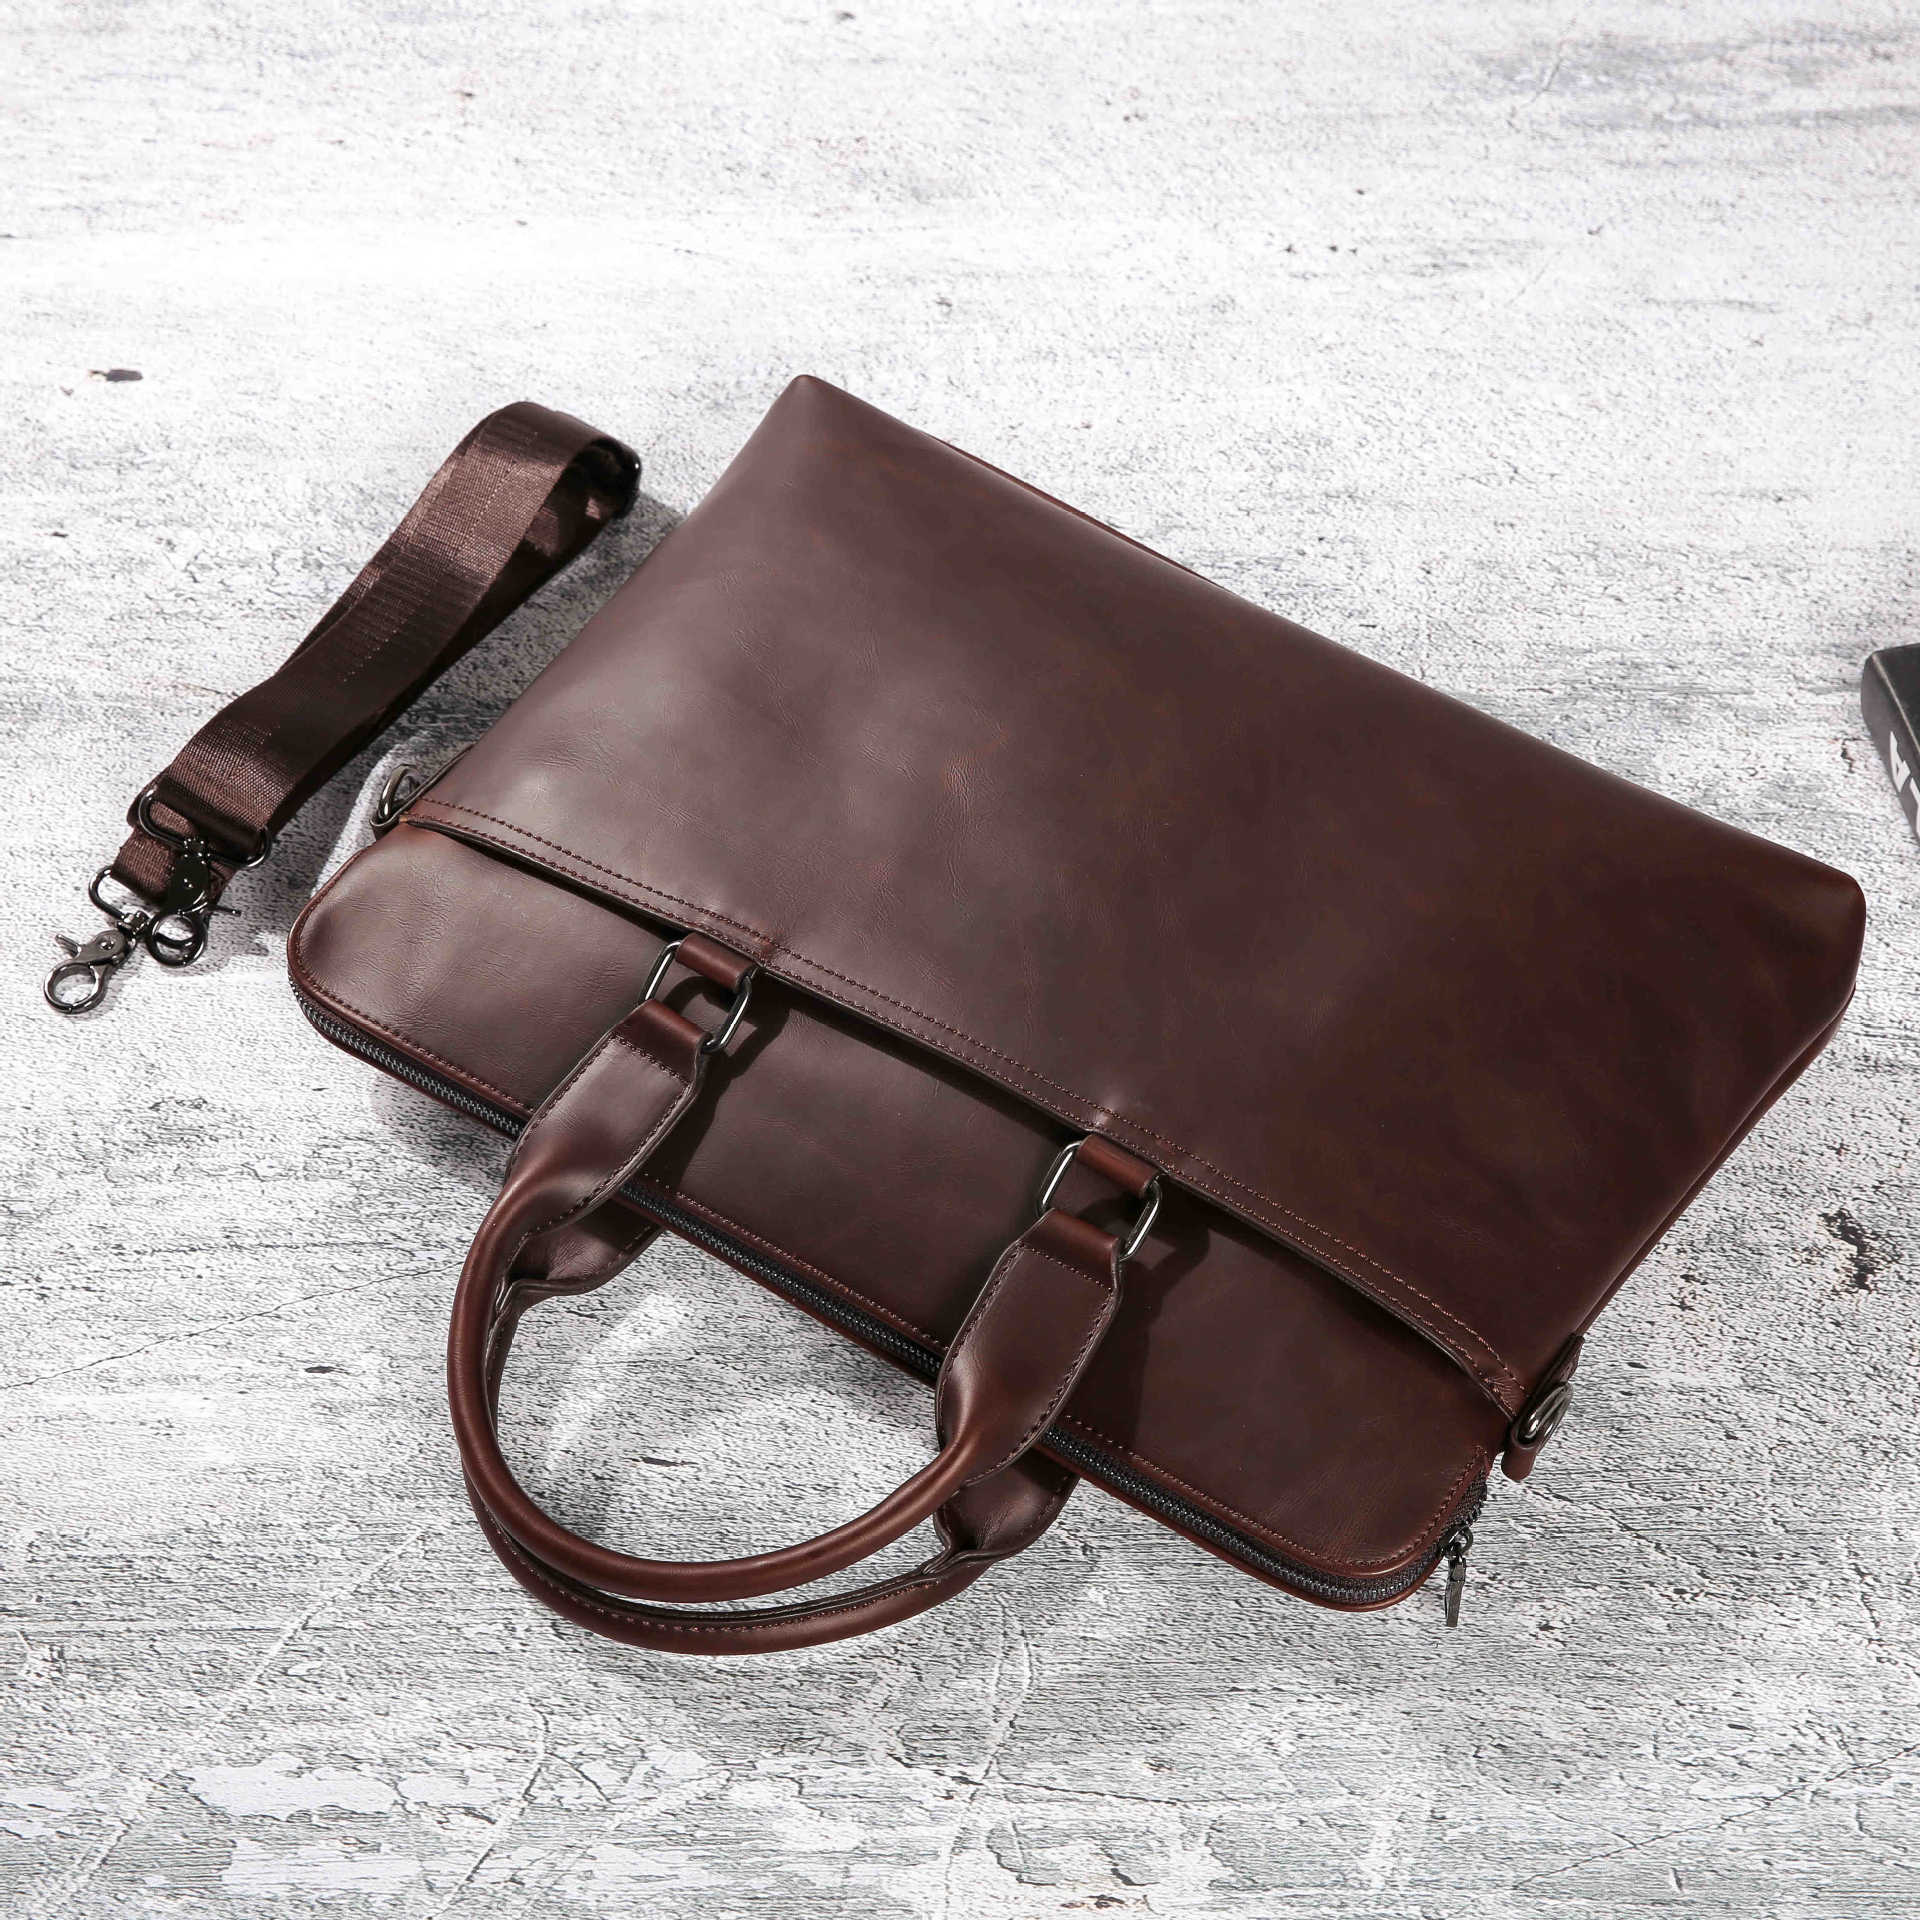 2019 Men's Promotion Simple Famous Brand Business Men Briefcase Bag Luxury Leather Laptop Bag Man Shoulder Bag bolsa maleta